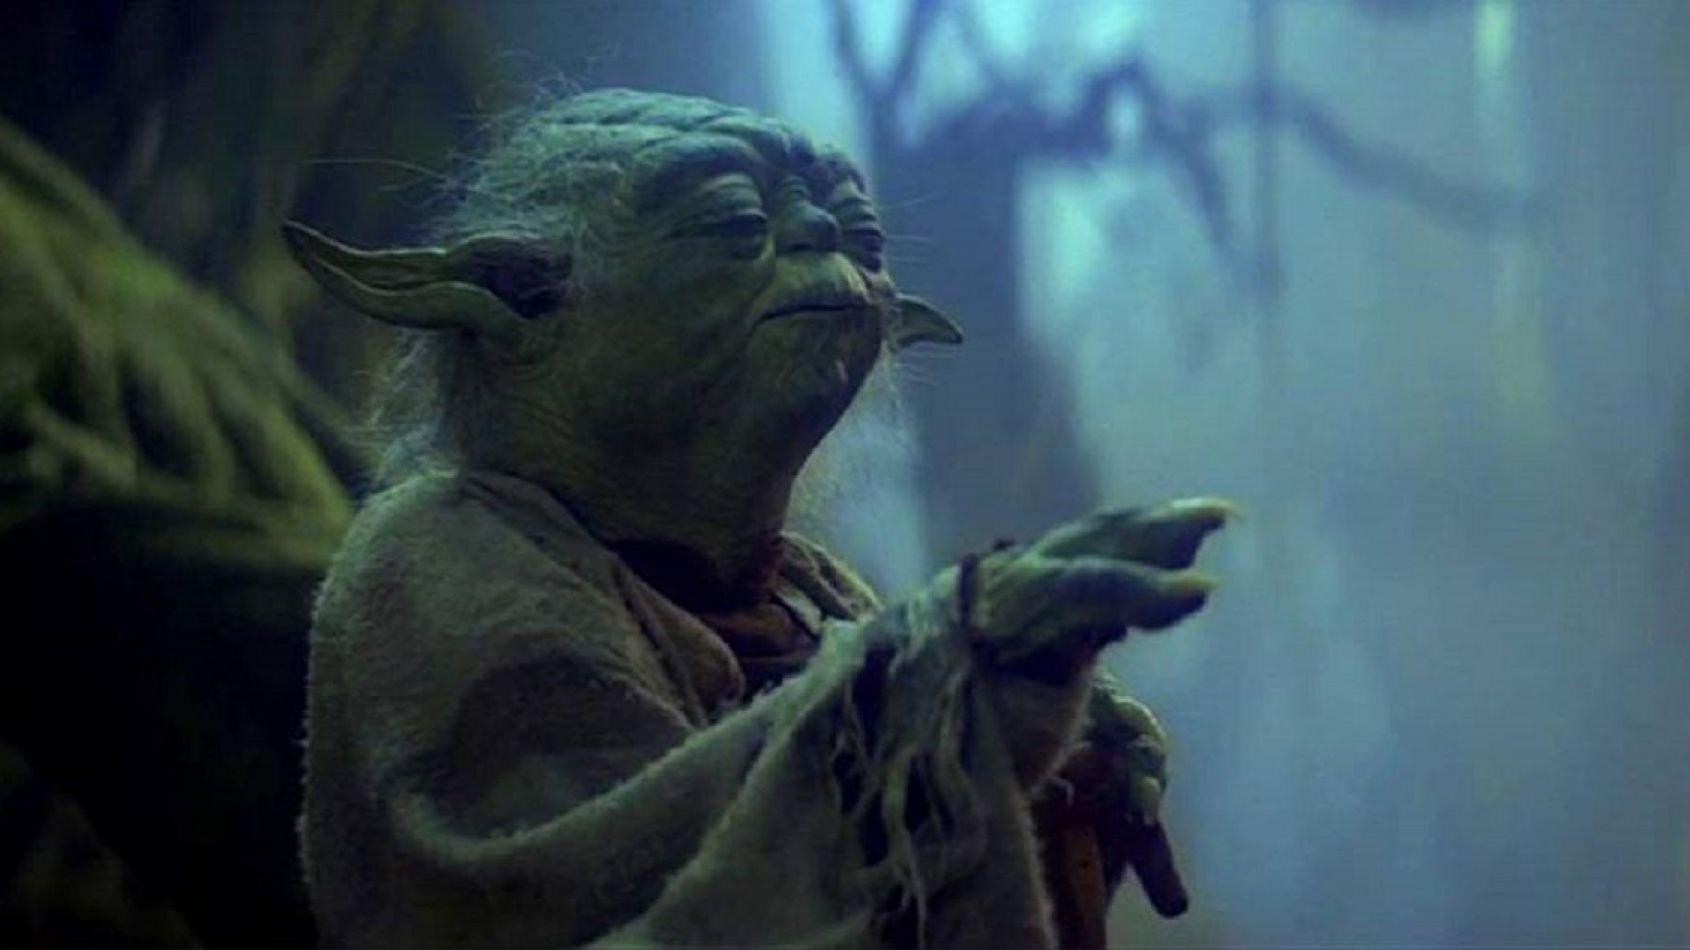 Yoda utilisant la Force par Attakus